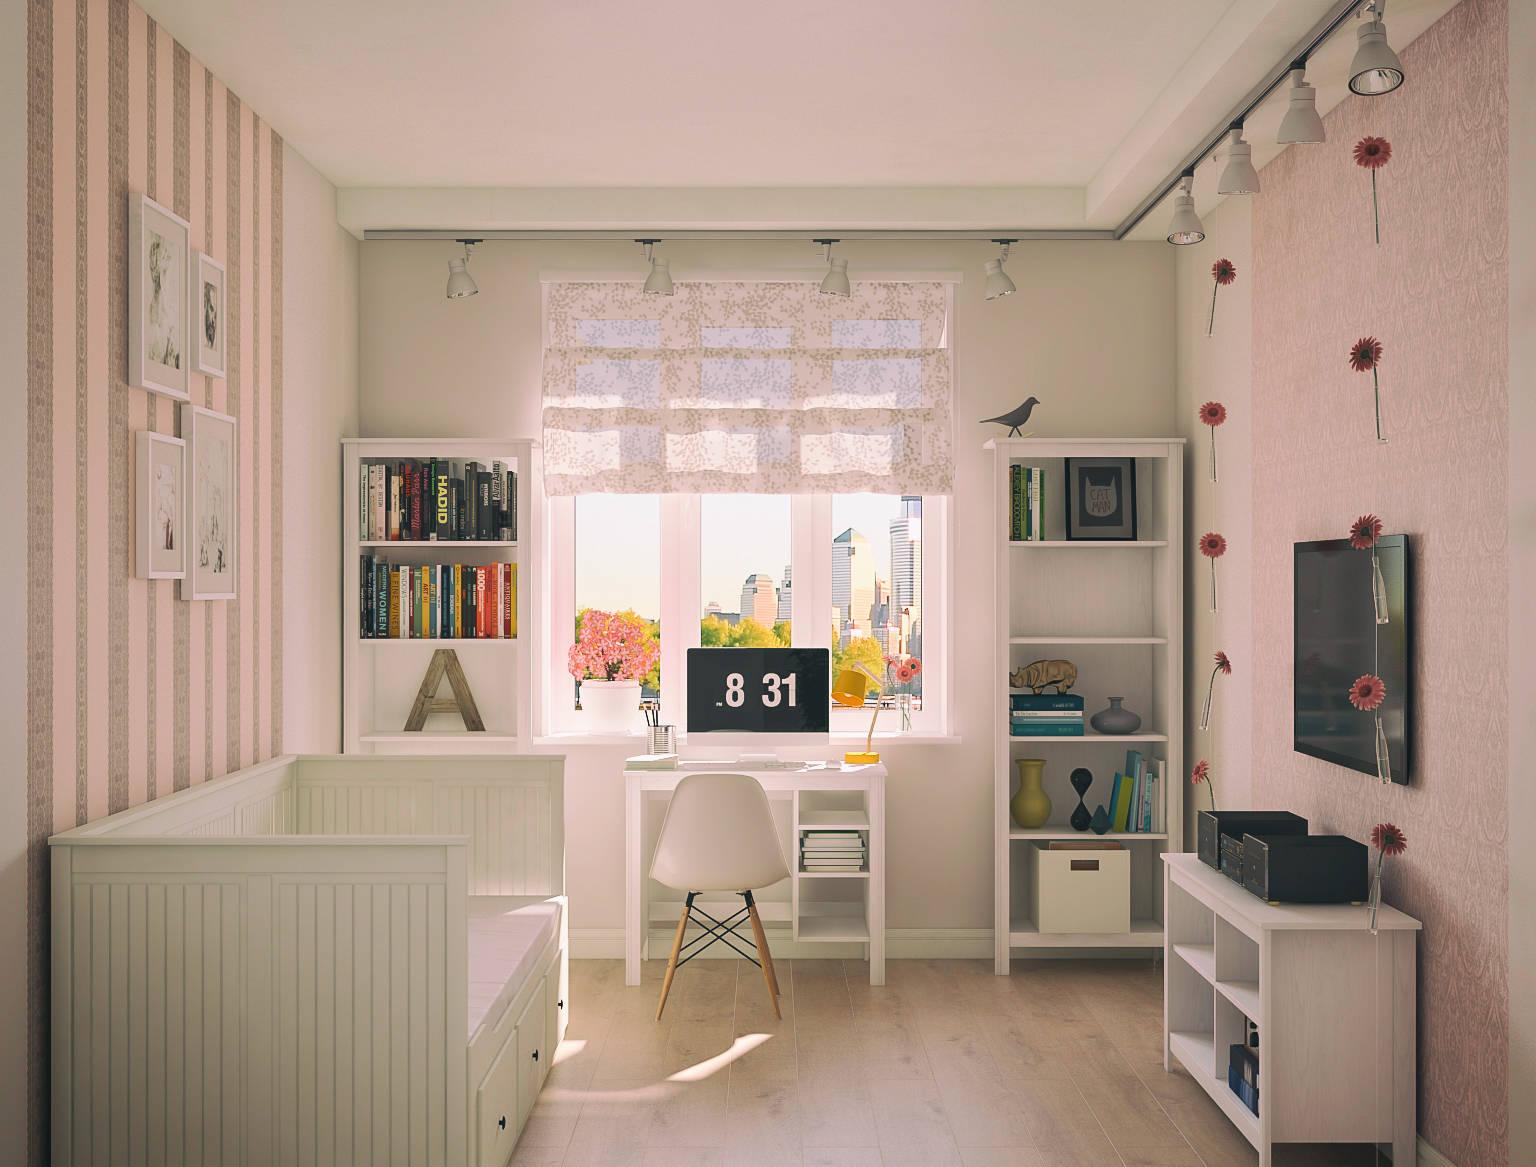 Квартира г. Москва - Спальня_вид1